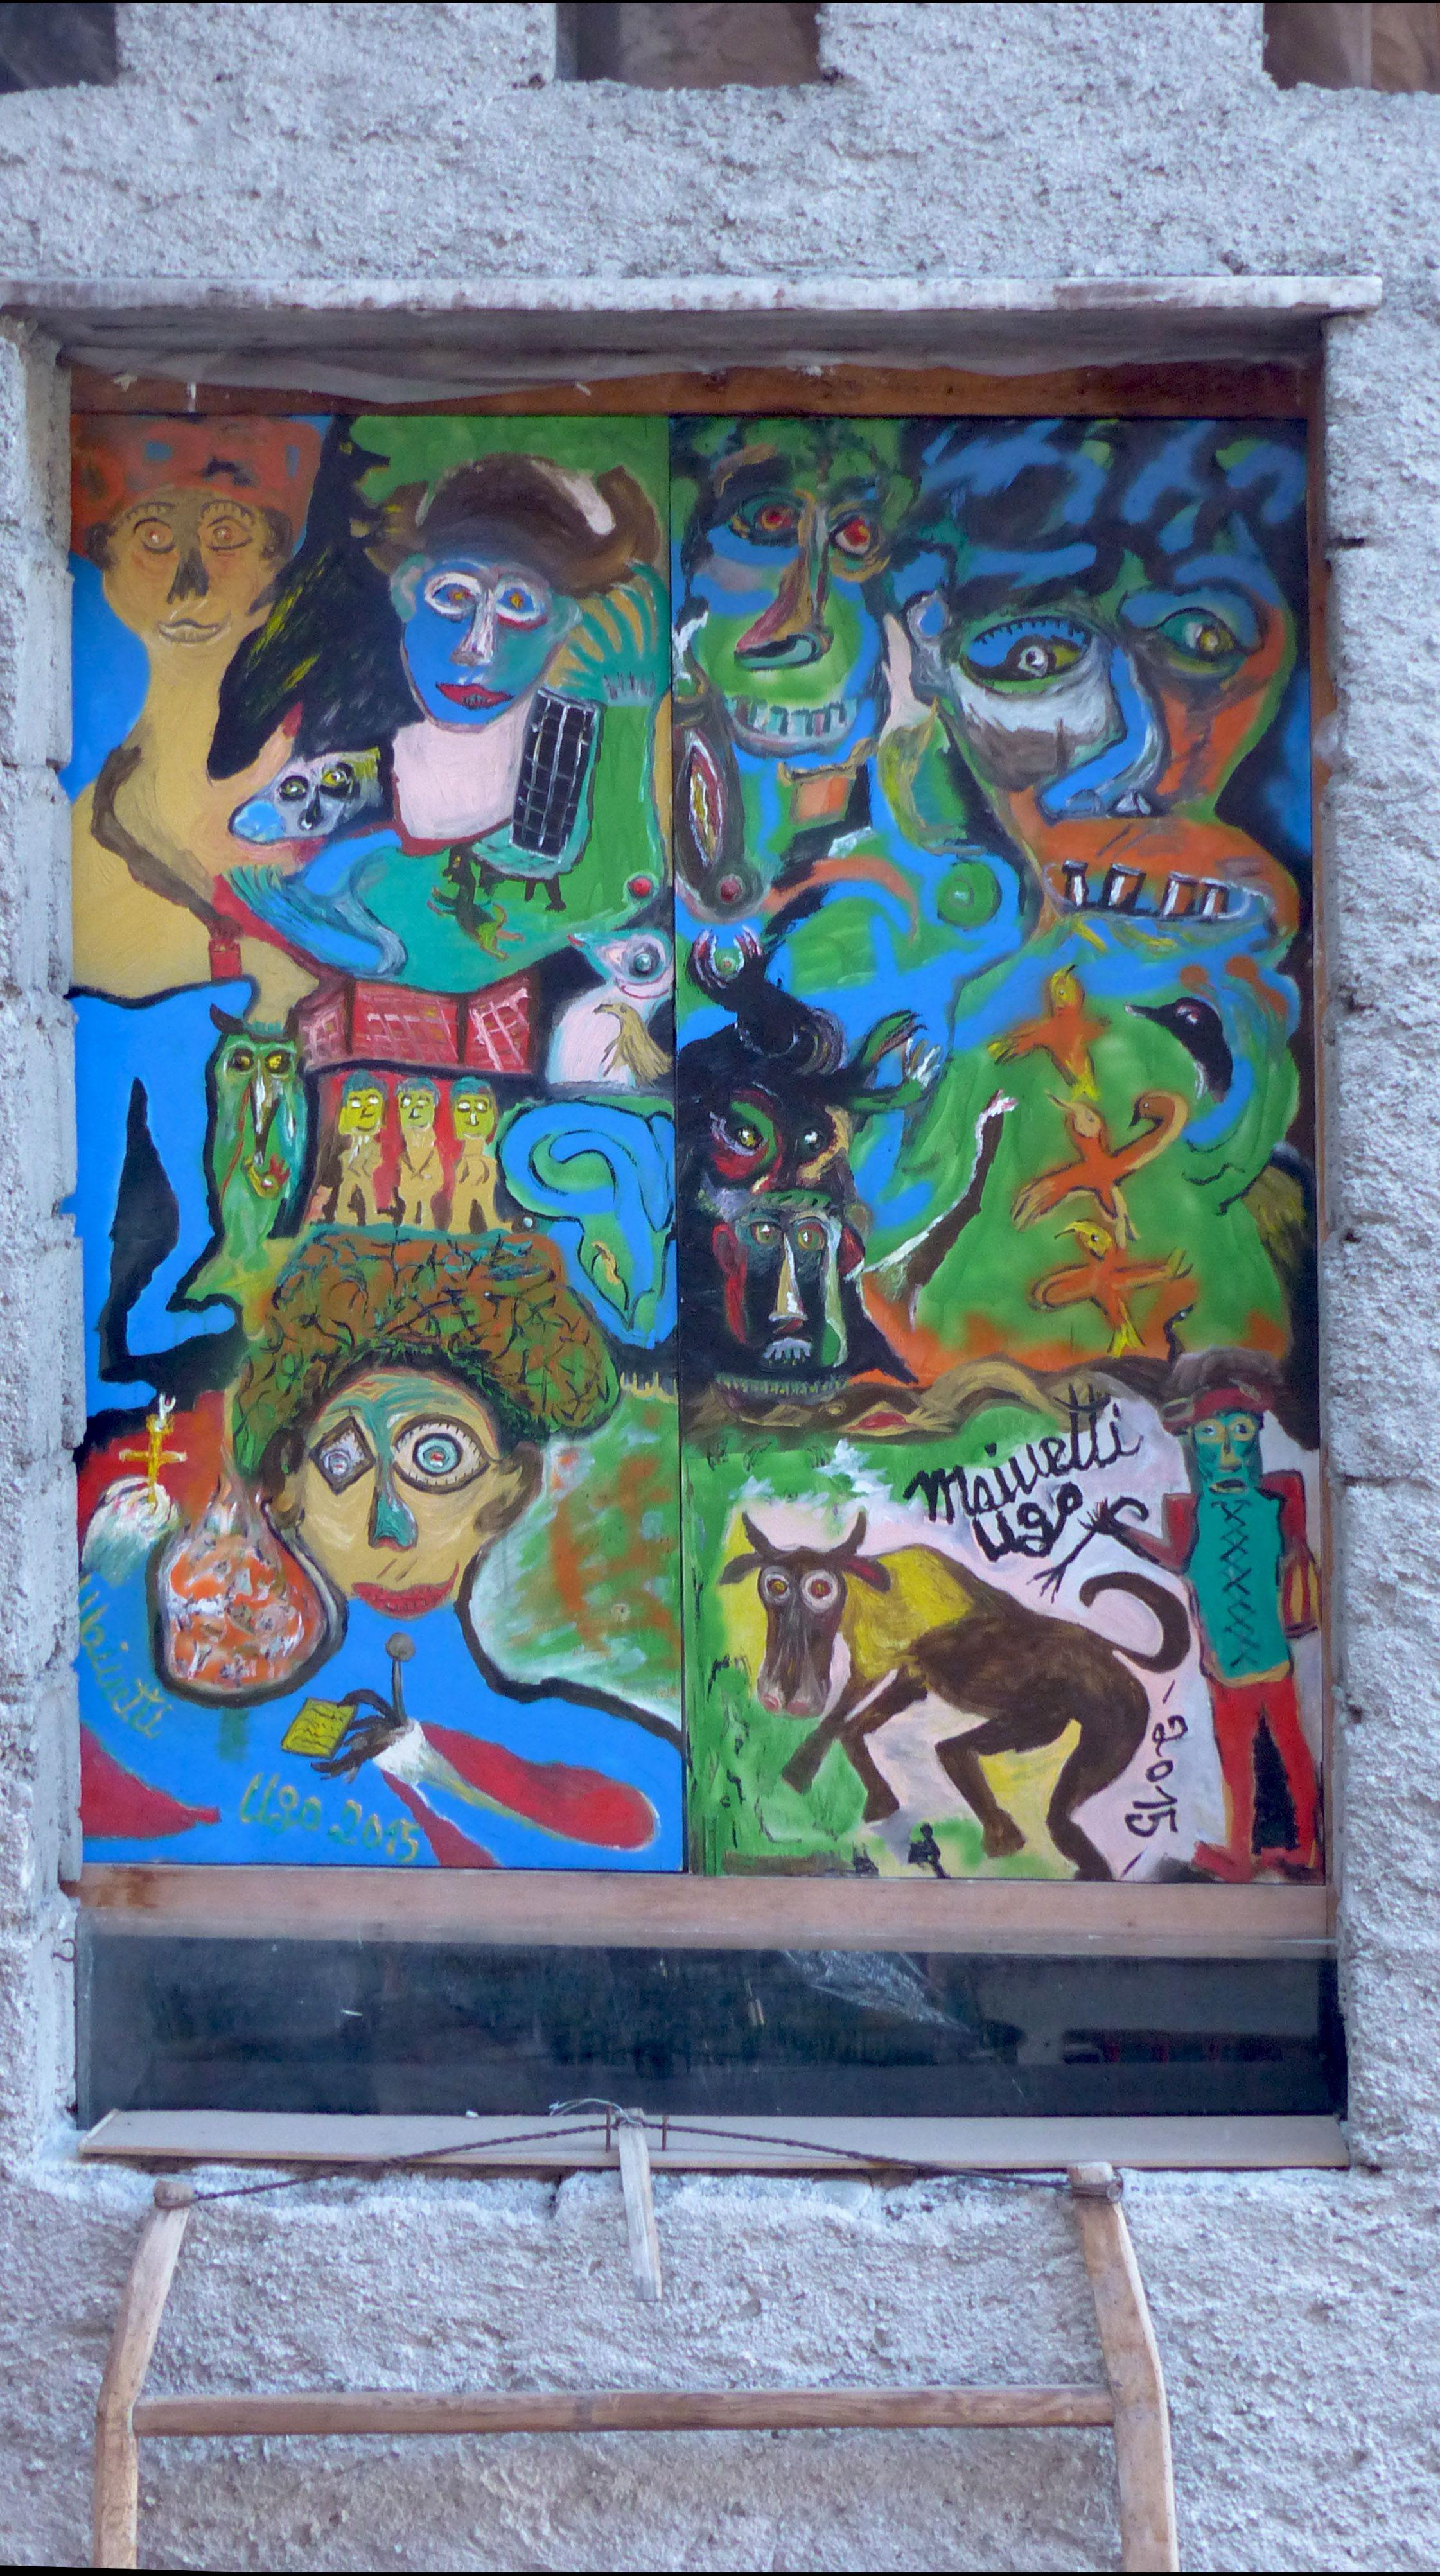 Elegant Malerei Im Innenhof Des Hauses Von Ugo Mainetti In Tirano